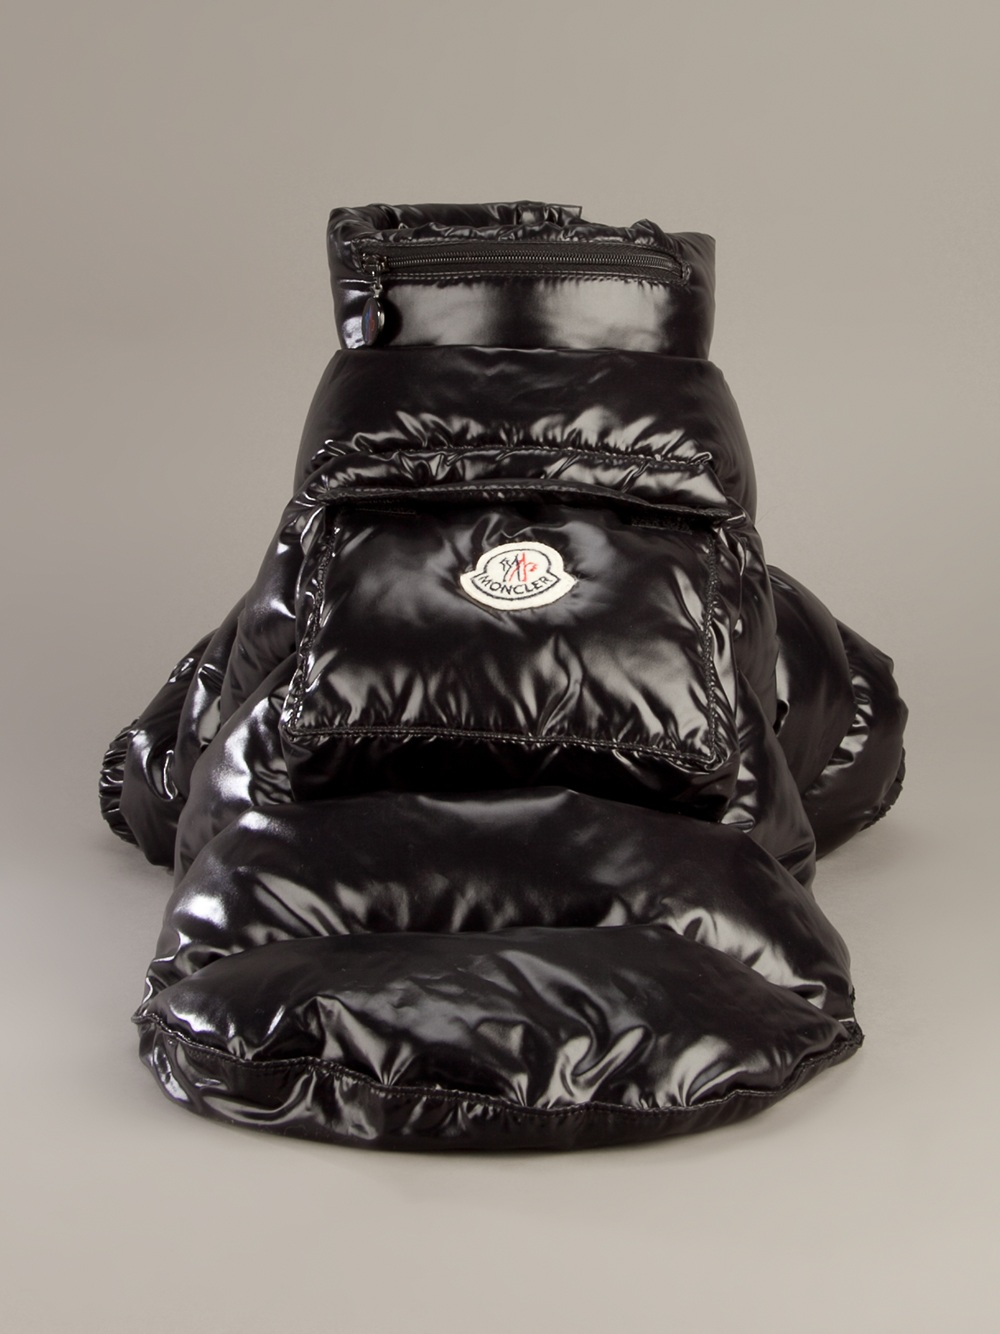 2cae2c6bd Moncler Dog Coat in Black - Lyst